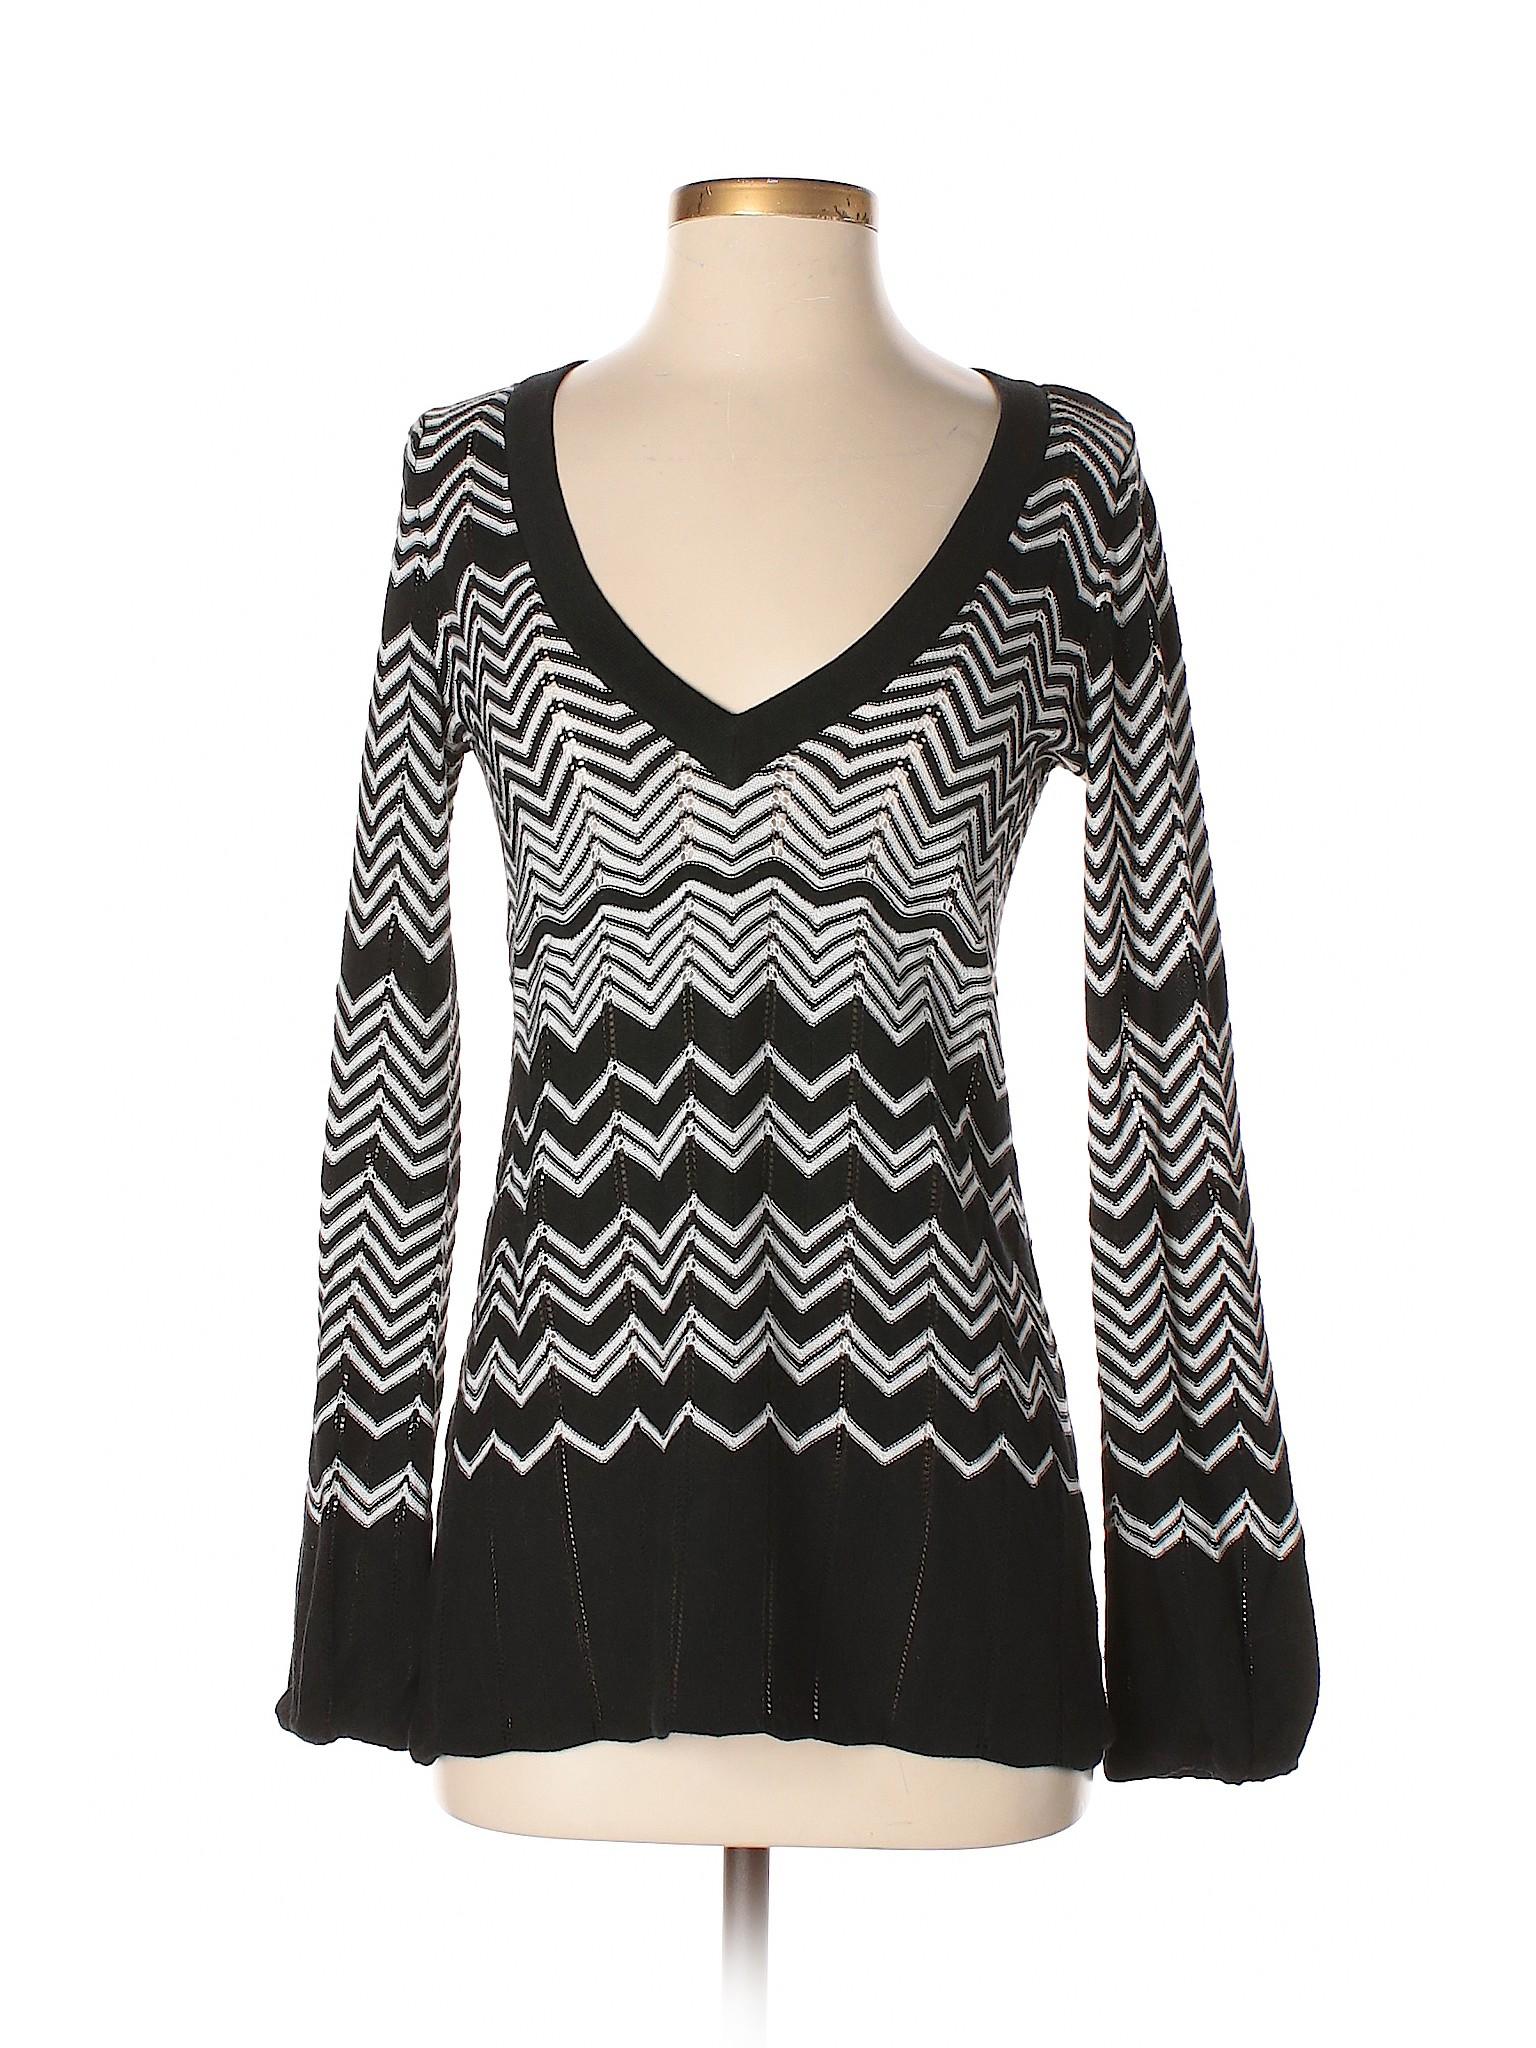 Boutique House White Black Market Sweater Pullover rxrSw